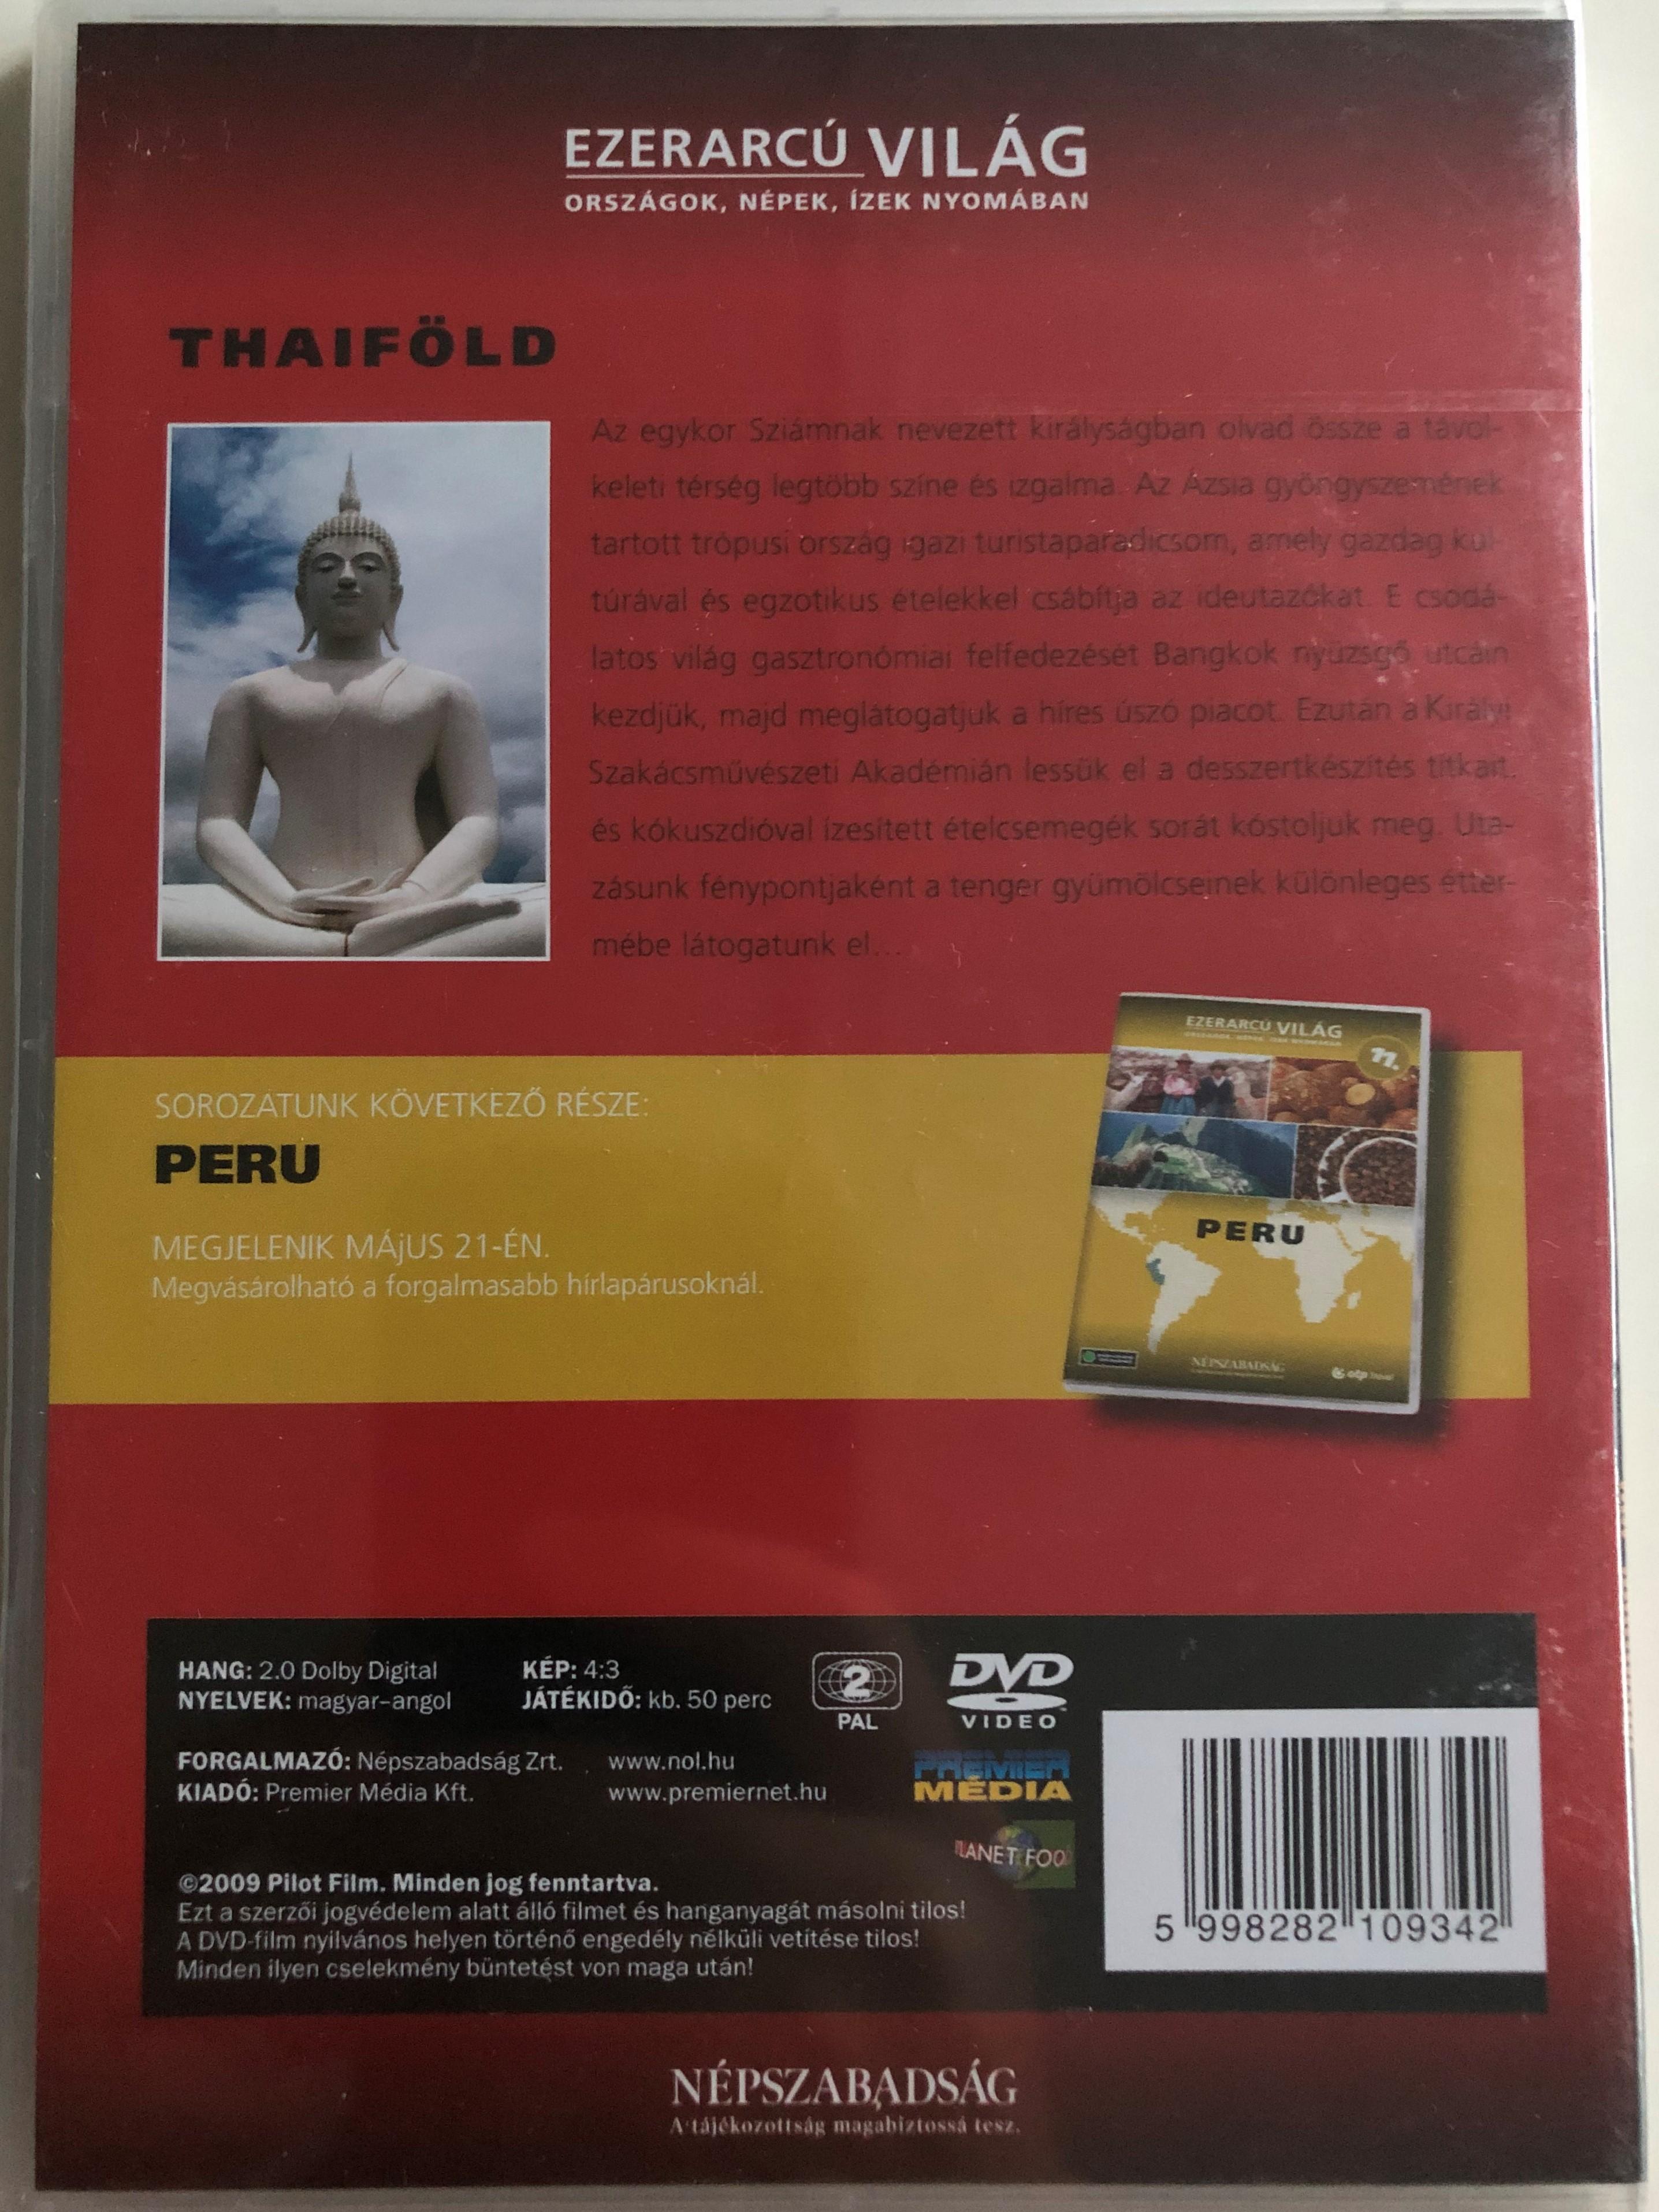 ezerarc-vil-g-vol.-10-thaif-ld-thailand-dvd-2009-orsz-gok-n-pek-zek-nyom-ban-20-x-dvd-set-2009-n-pszabads-g-premier-media-pilot-film-documentary-series-about-our-world-2-.jpg